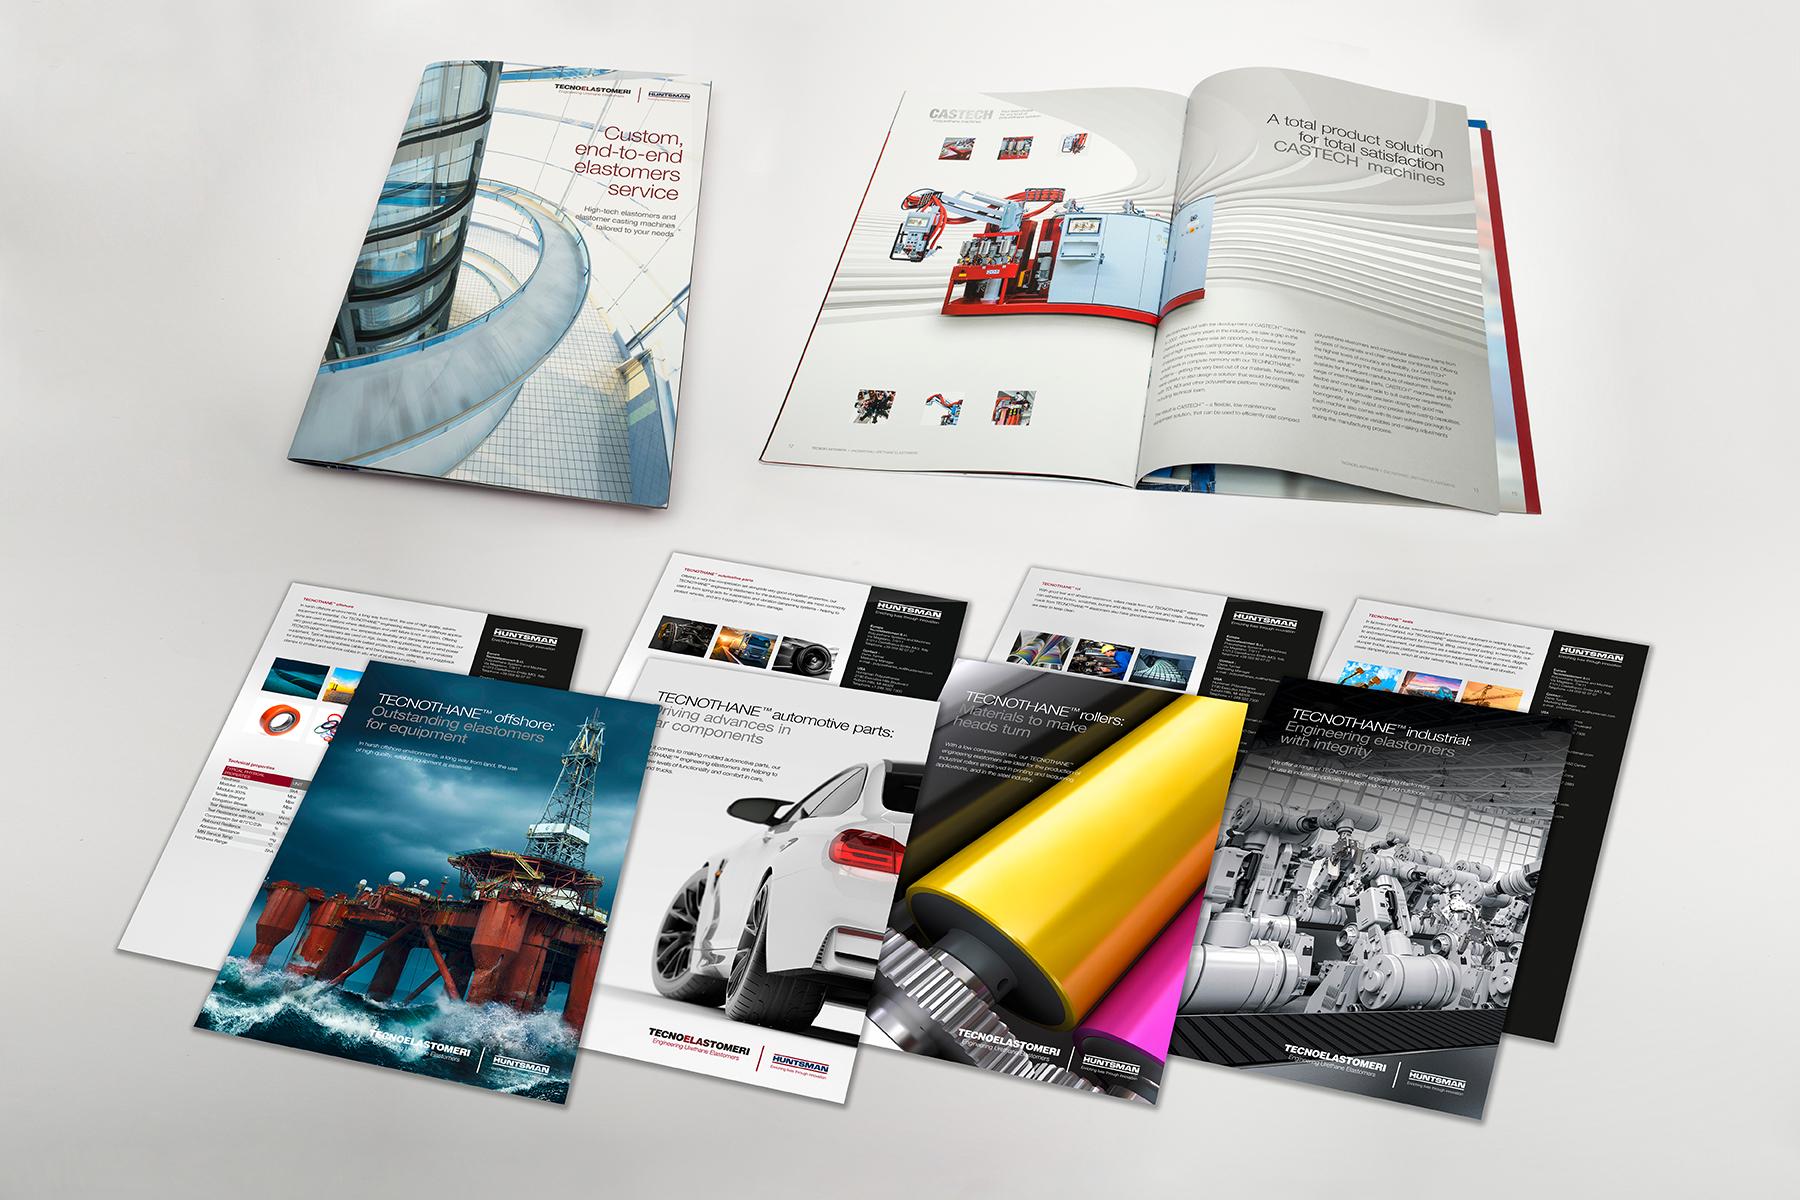 Centigrade - Huntsman Tecnoelastomeri Brochure